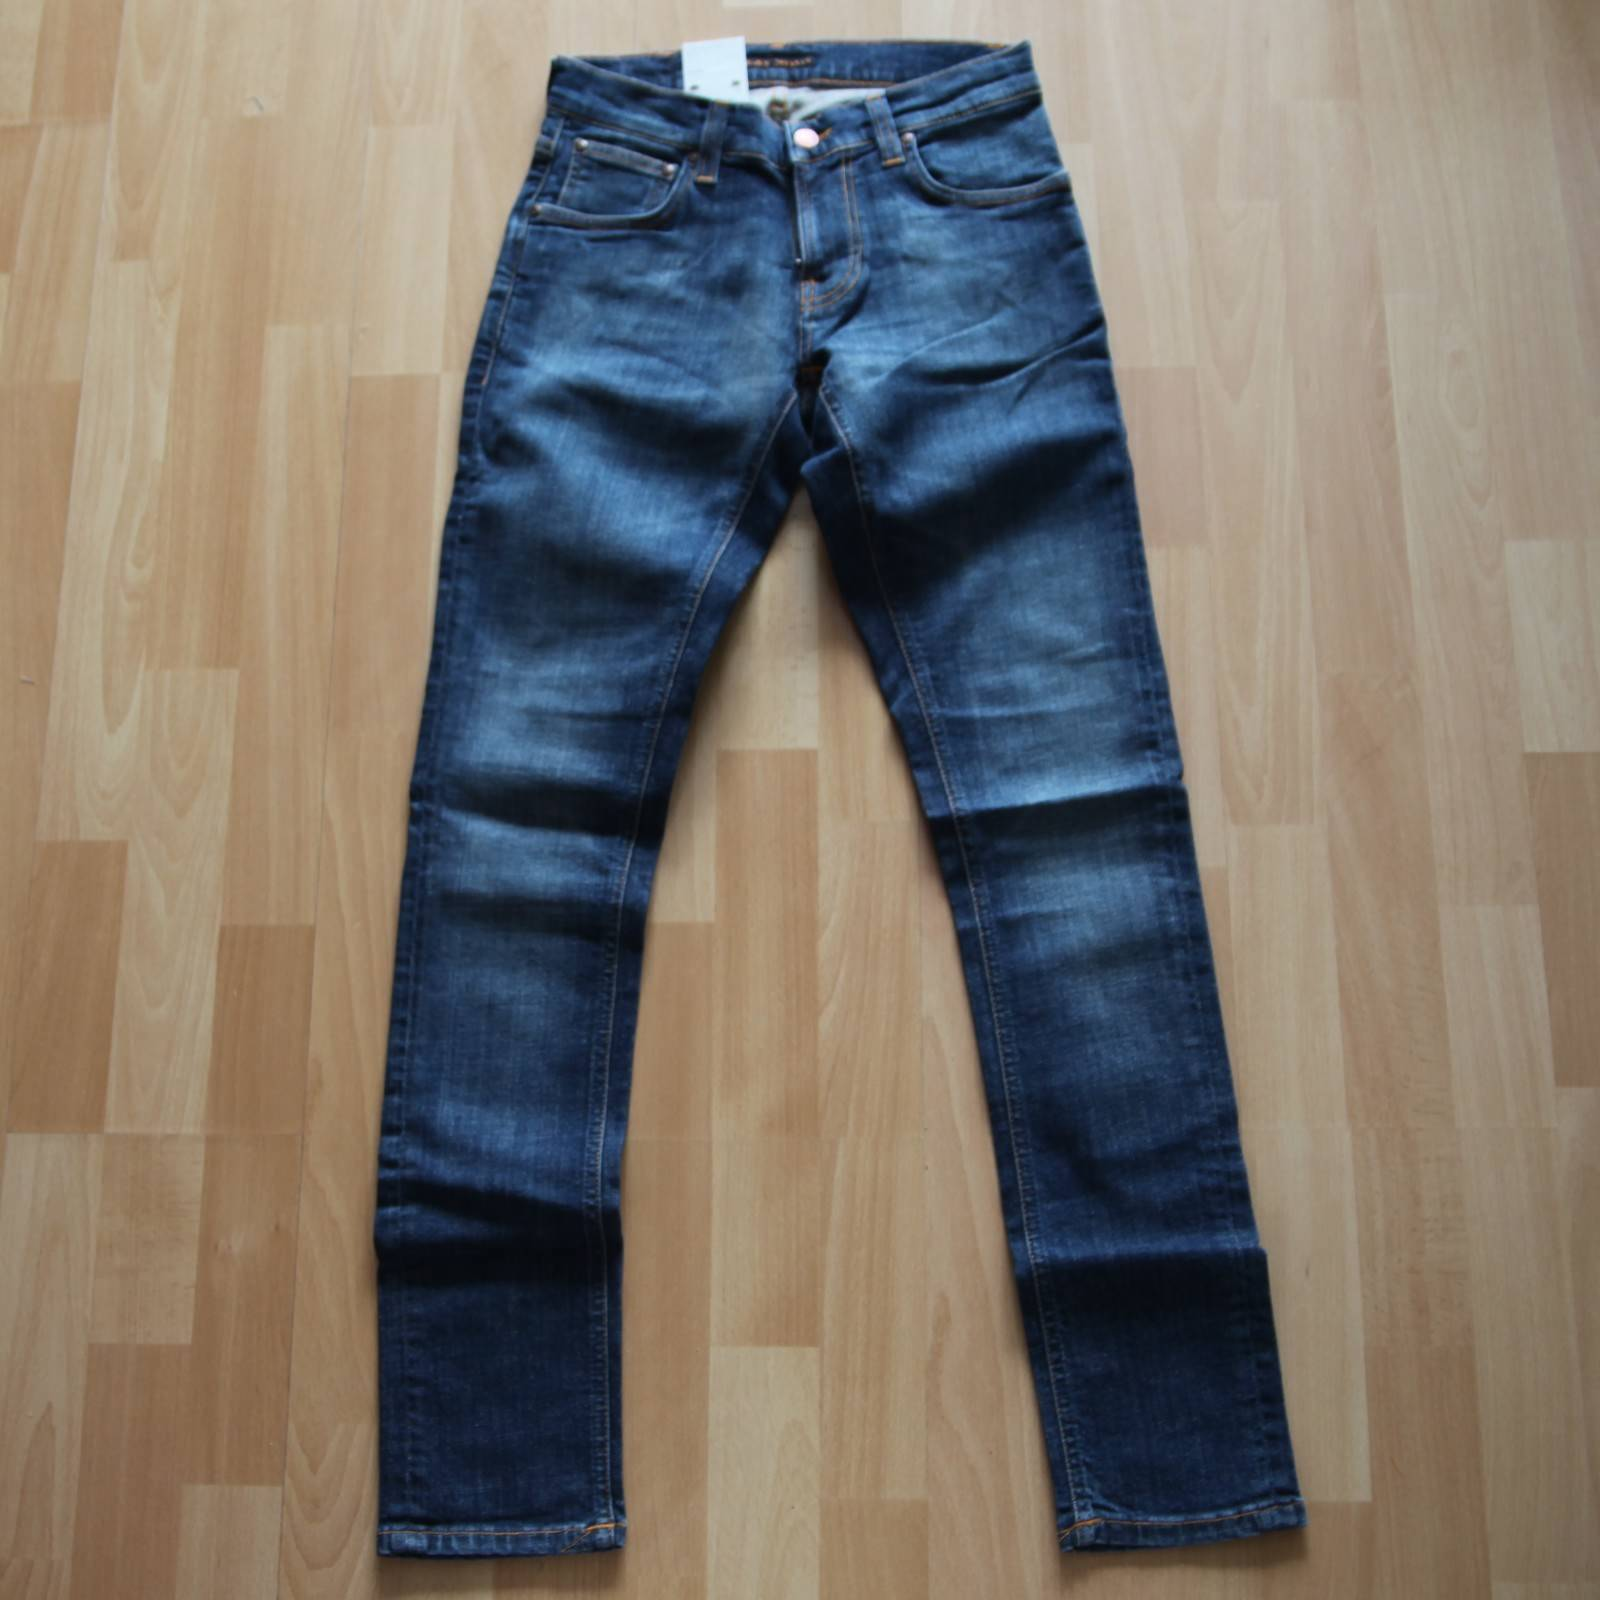 NUOVO Nudie Jeans tight Terry (tight antifit) Organic DARK Pacific 28 32